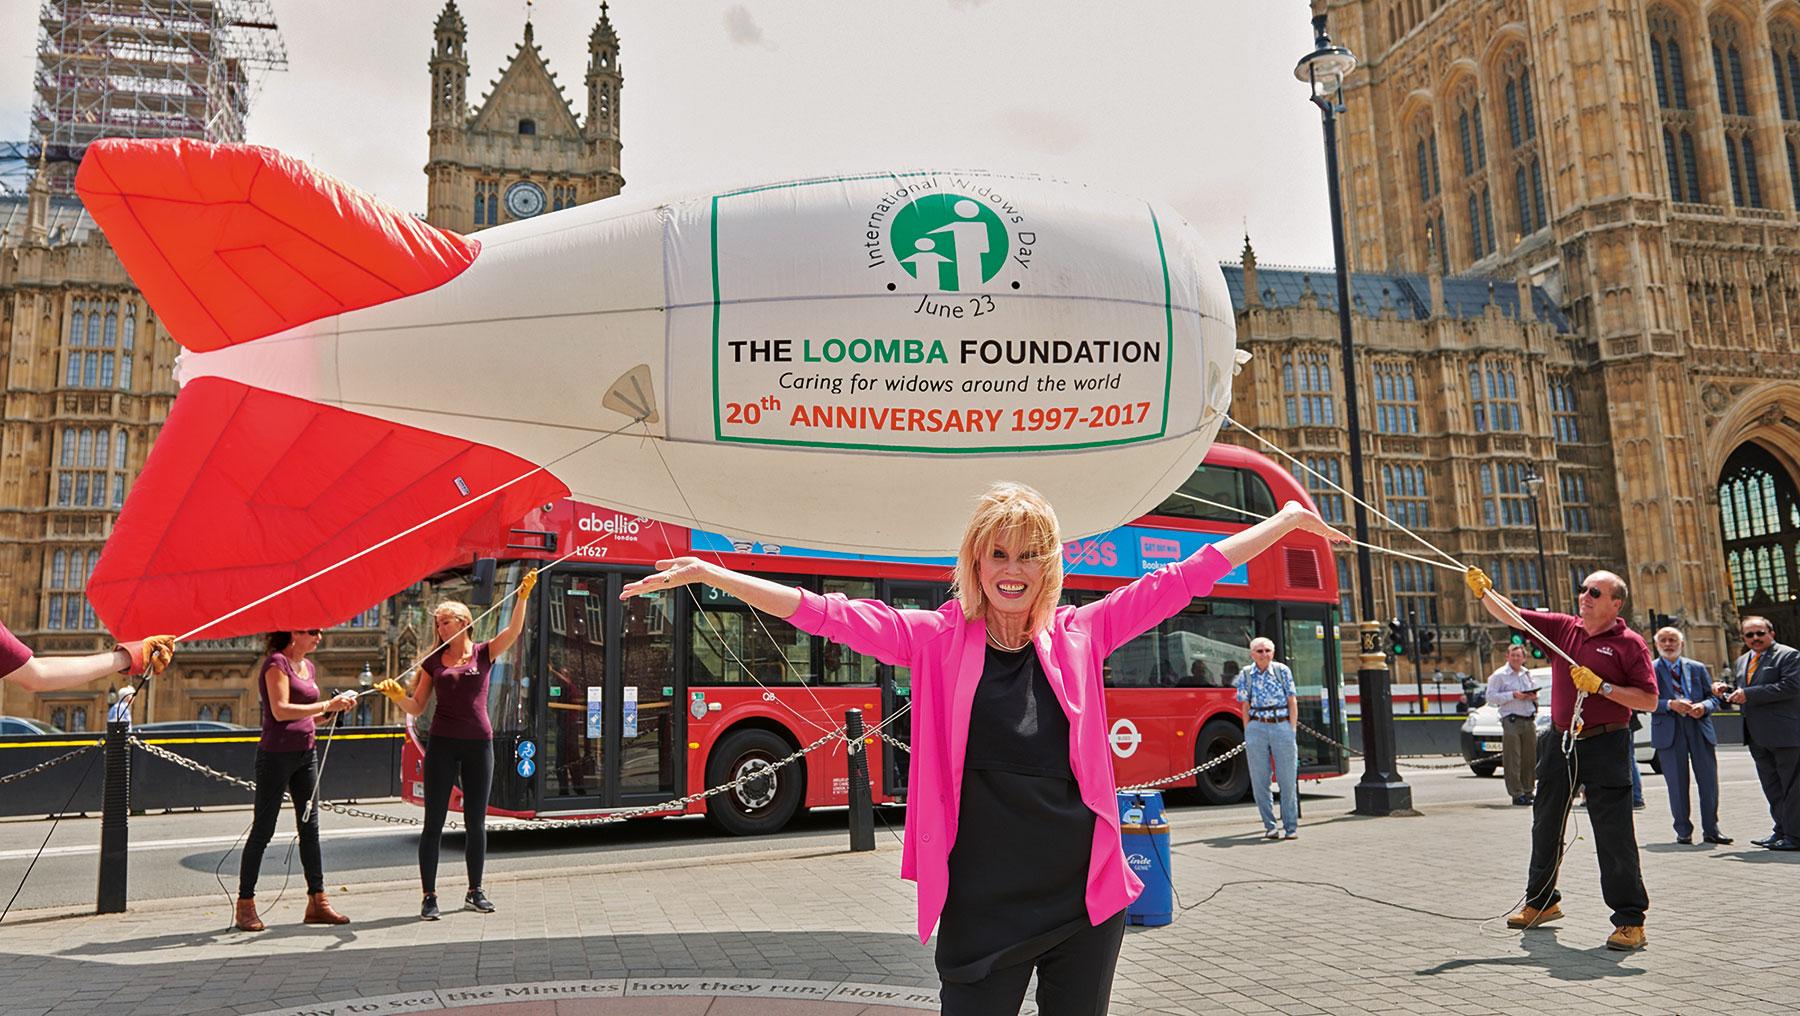 Joanna Lumley promotes International Widows Day